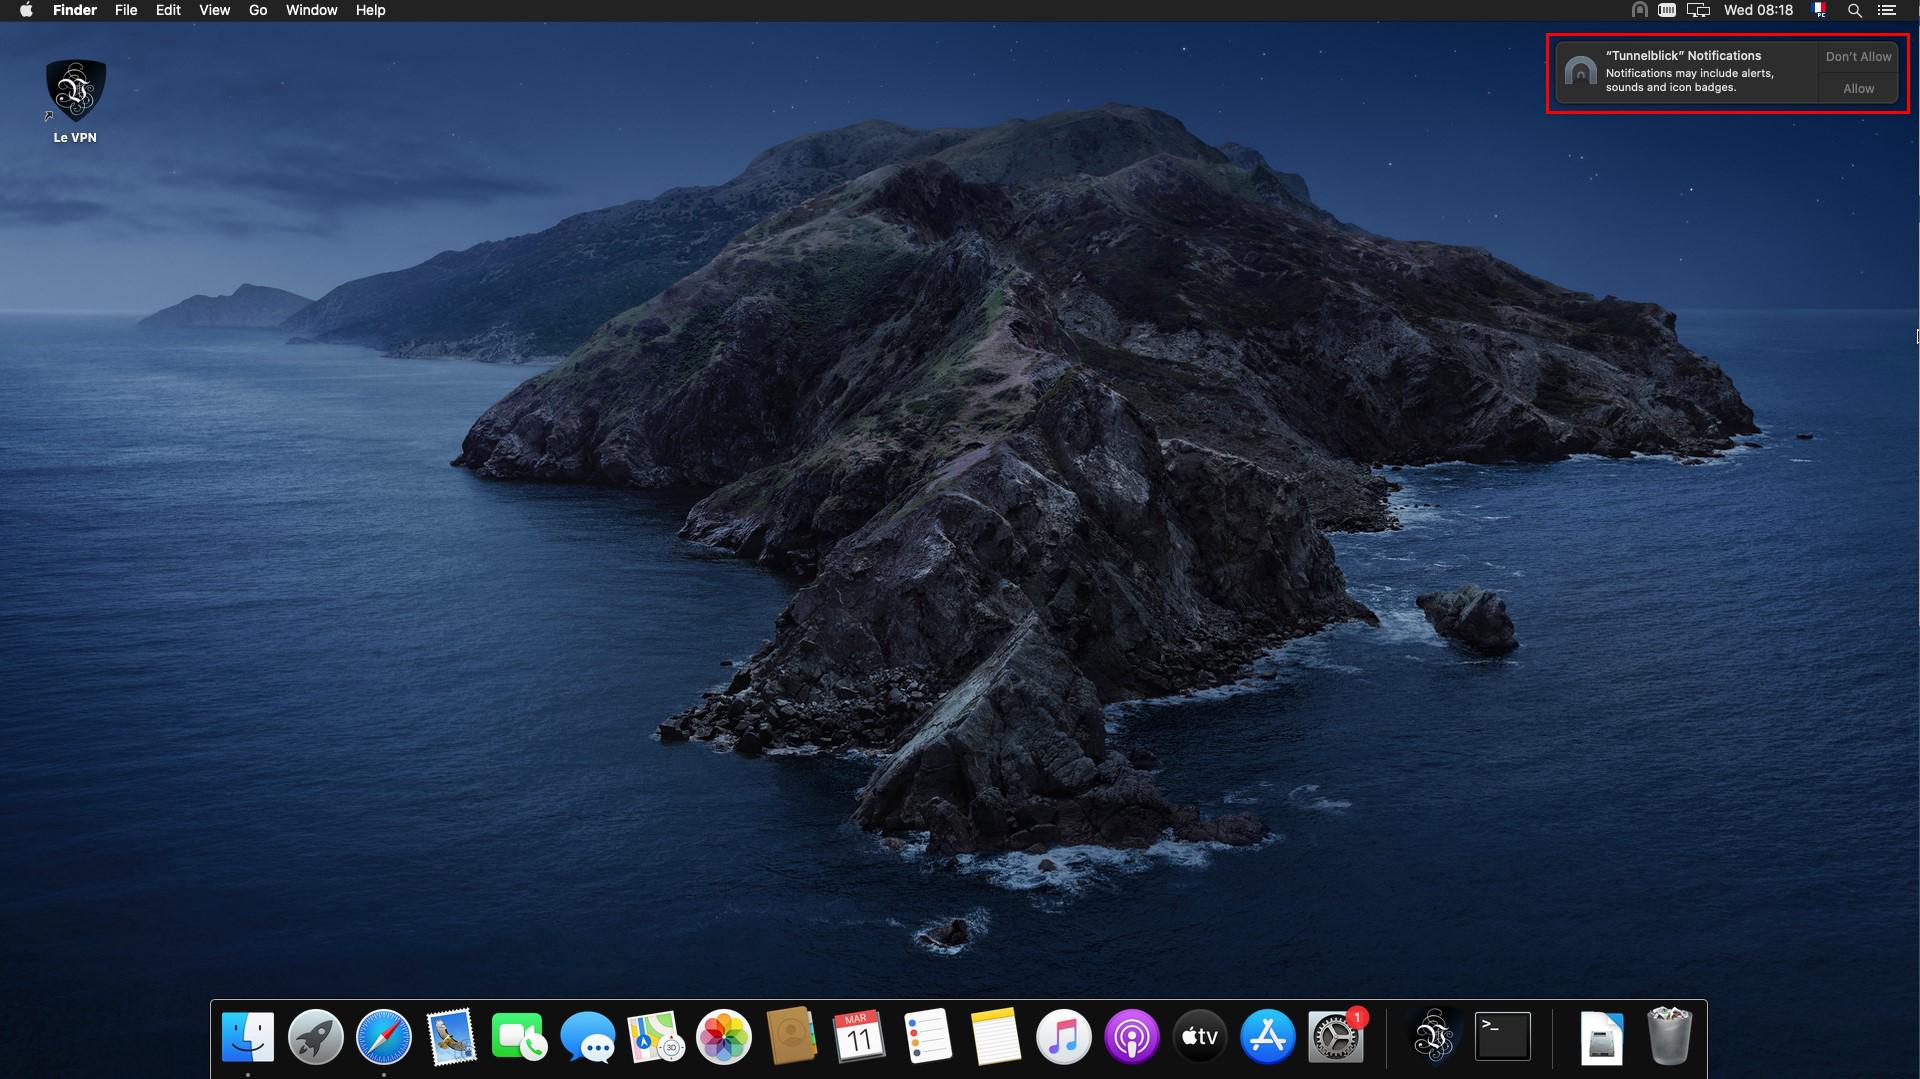 Le VPN MacOS OpenVPN Tunnelblick